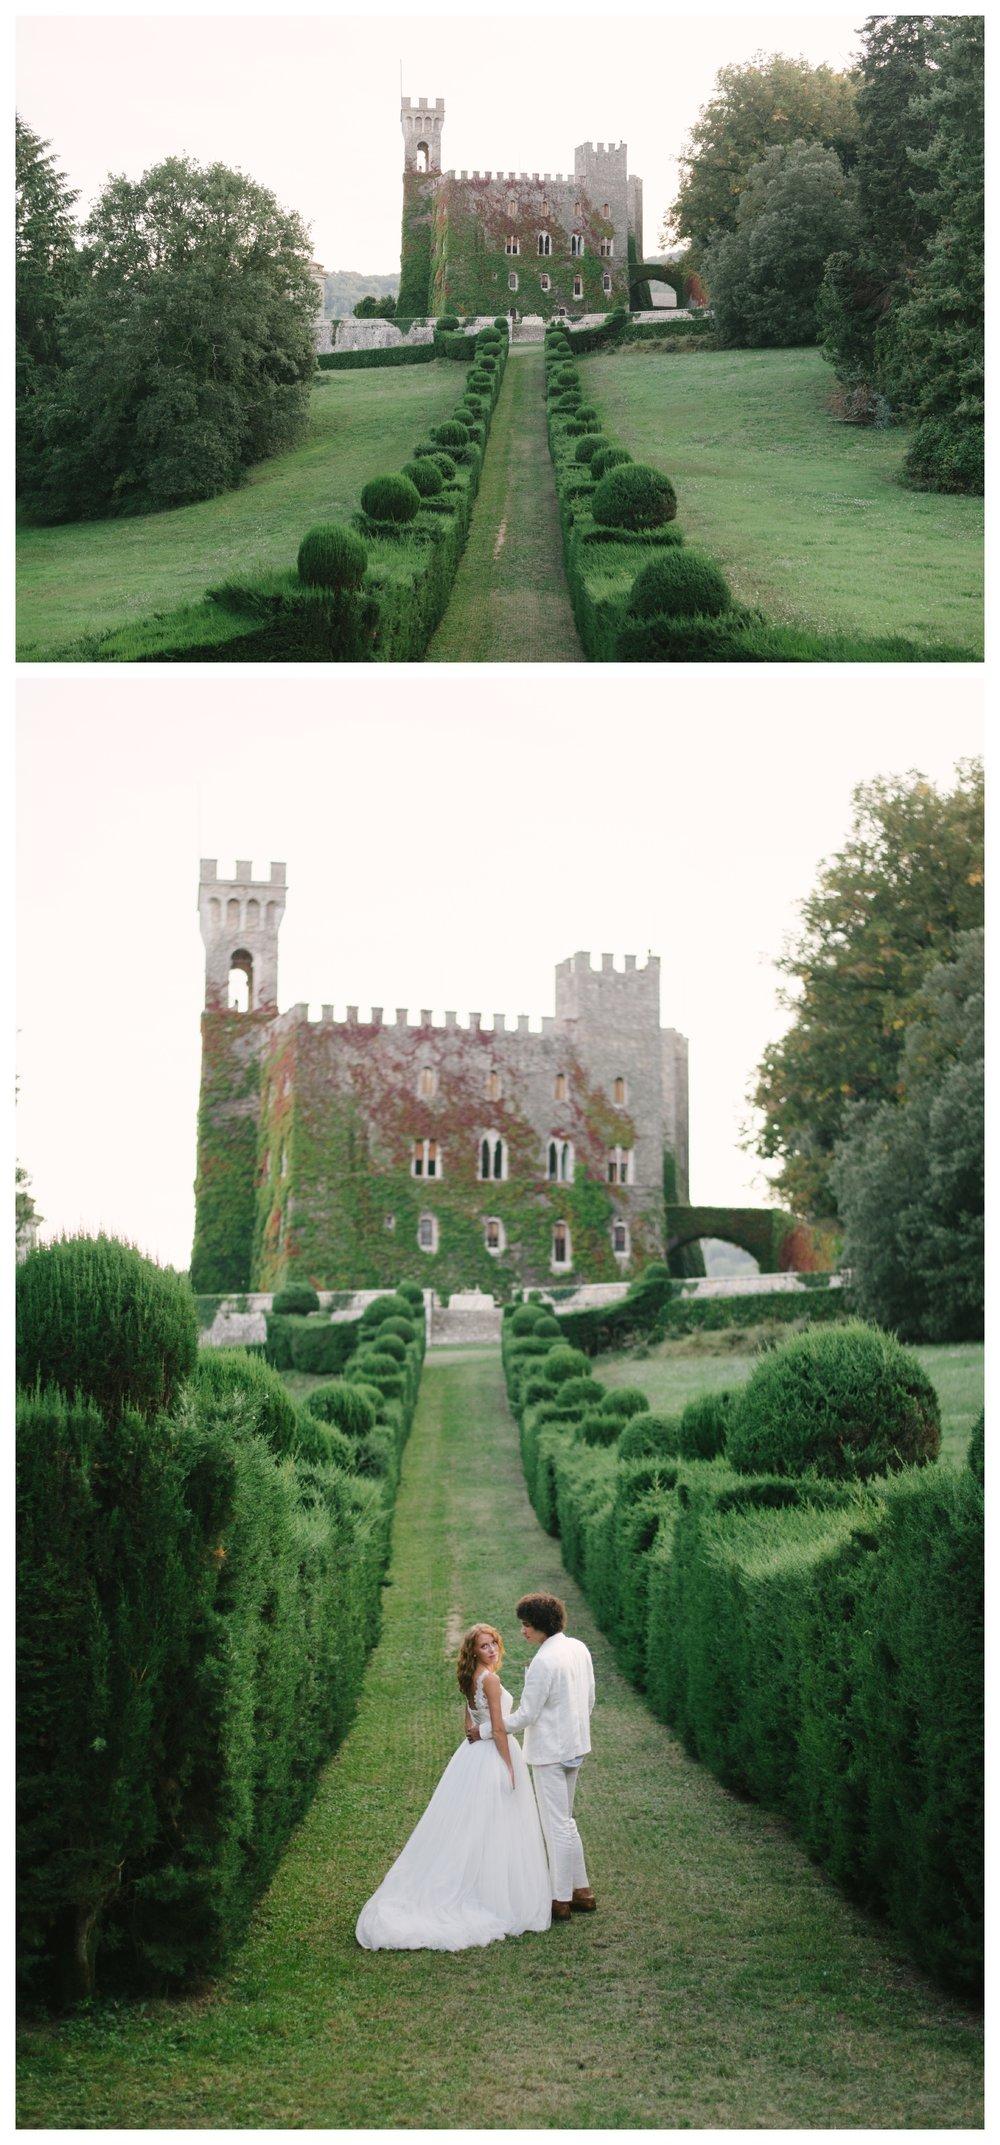 tuscany-castle-wedding-photographer-italy-williamsburgphotostudios-_0013.jpg